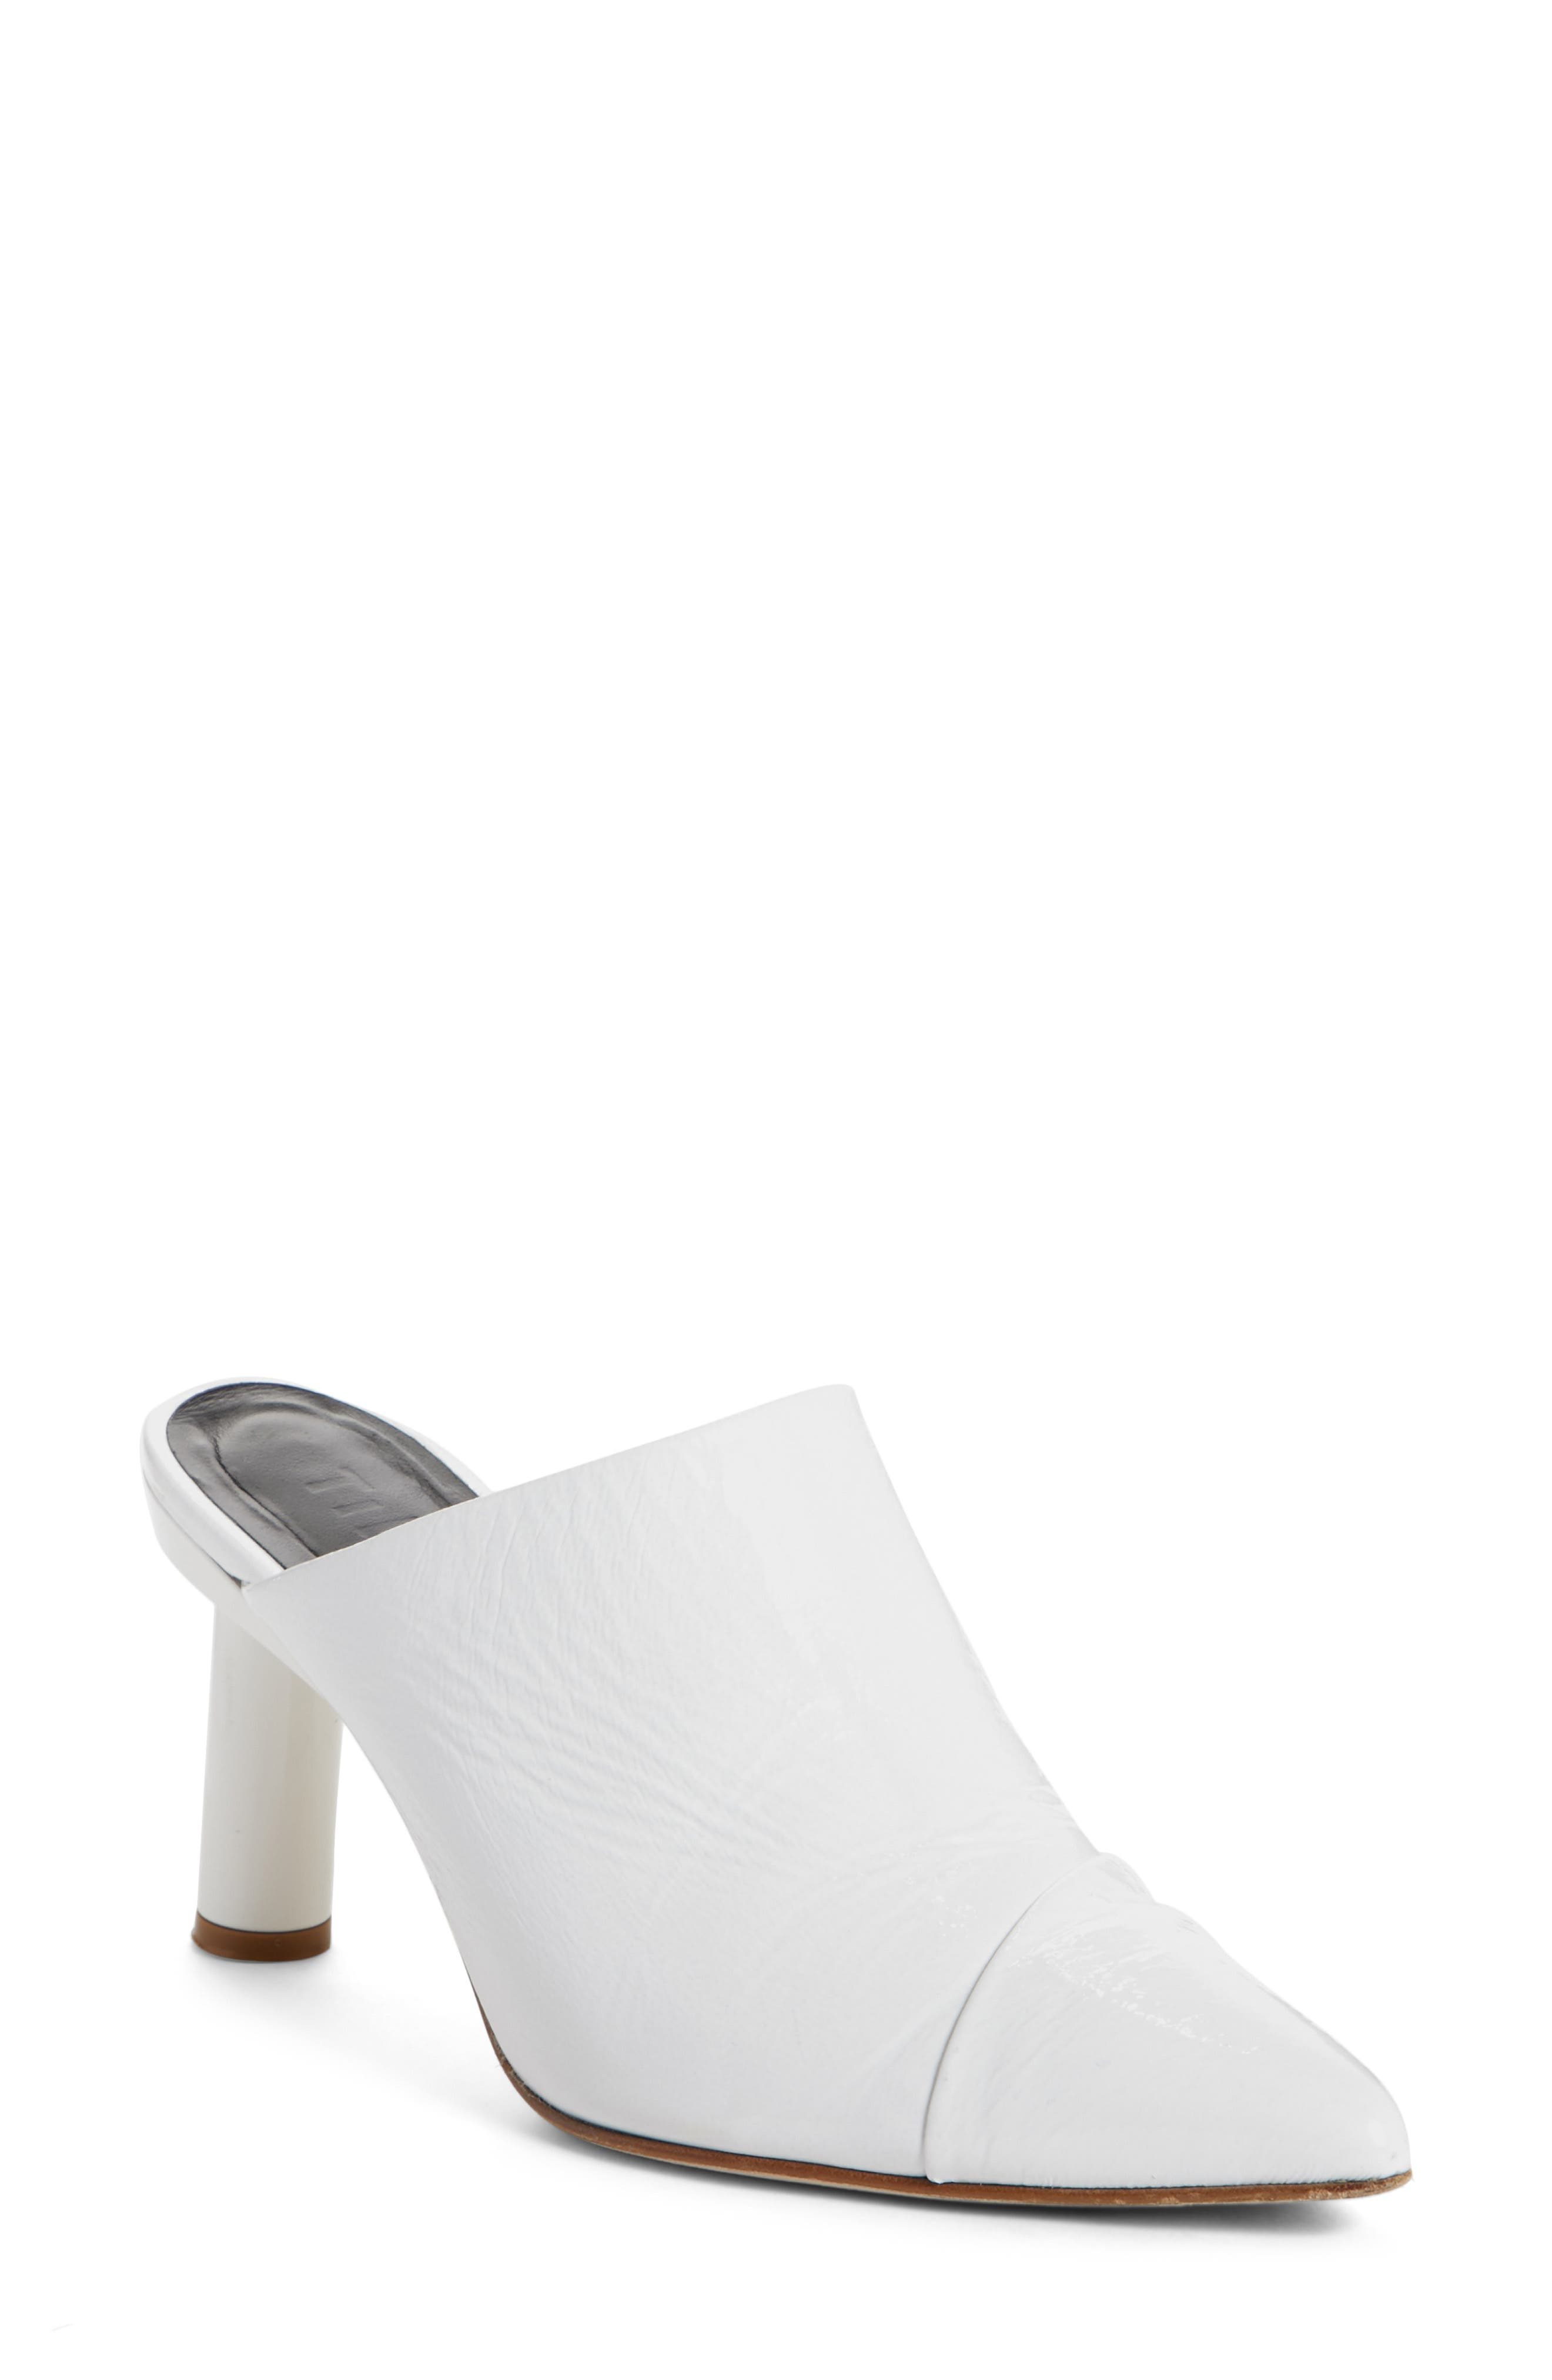 Liam Pointy Toe Mule,                         Main,                         color, Bright White